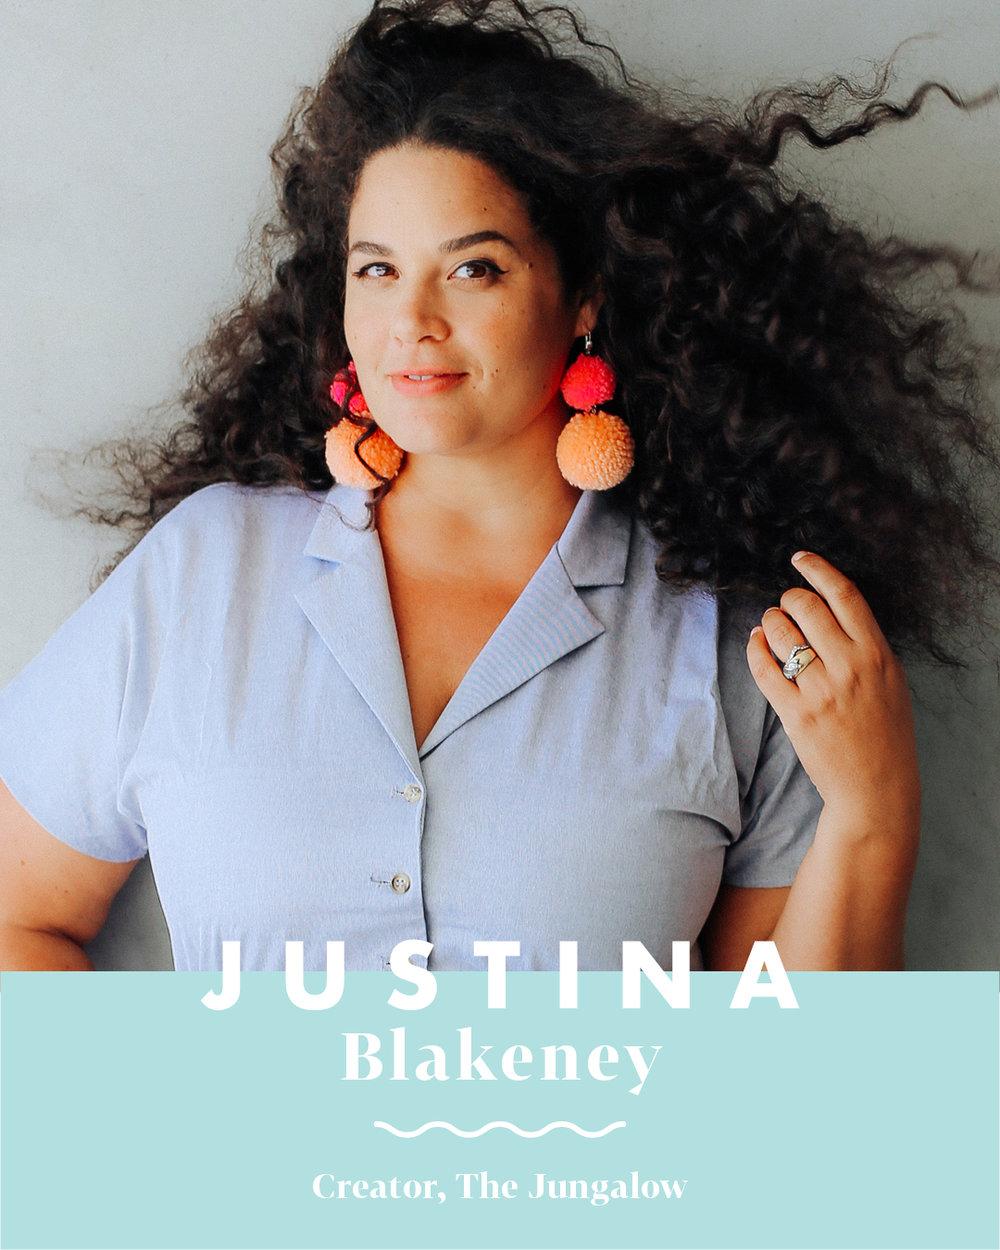 justina-blakeney.jpg